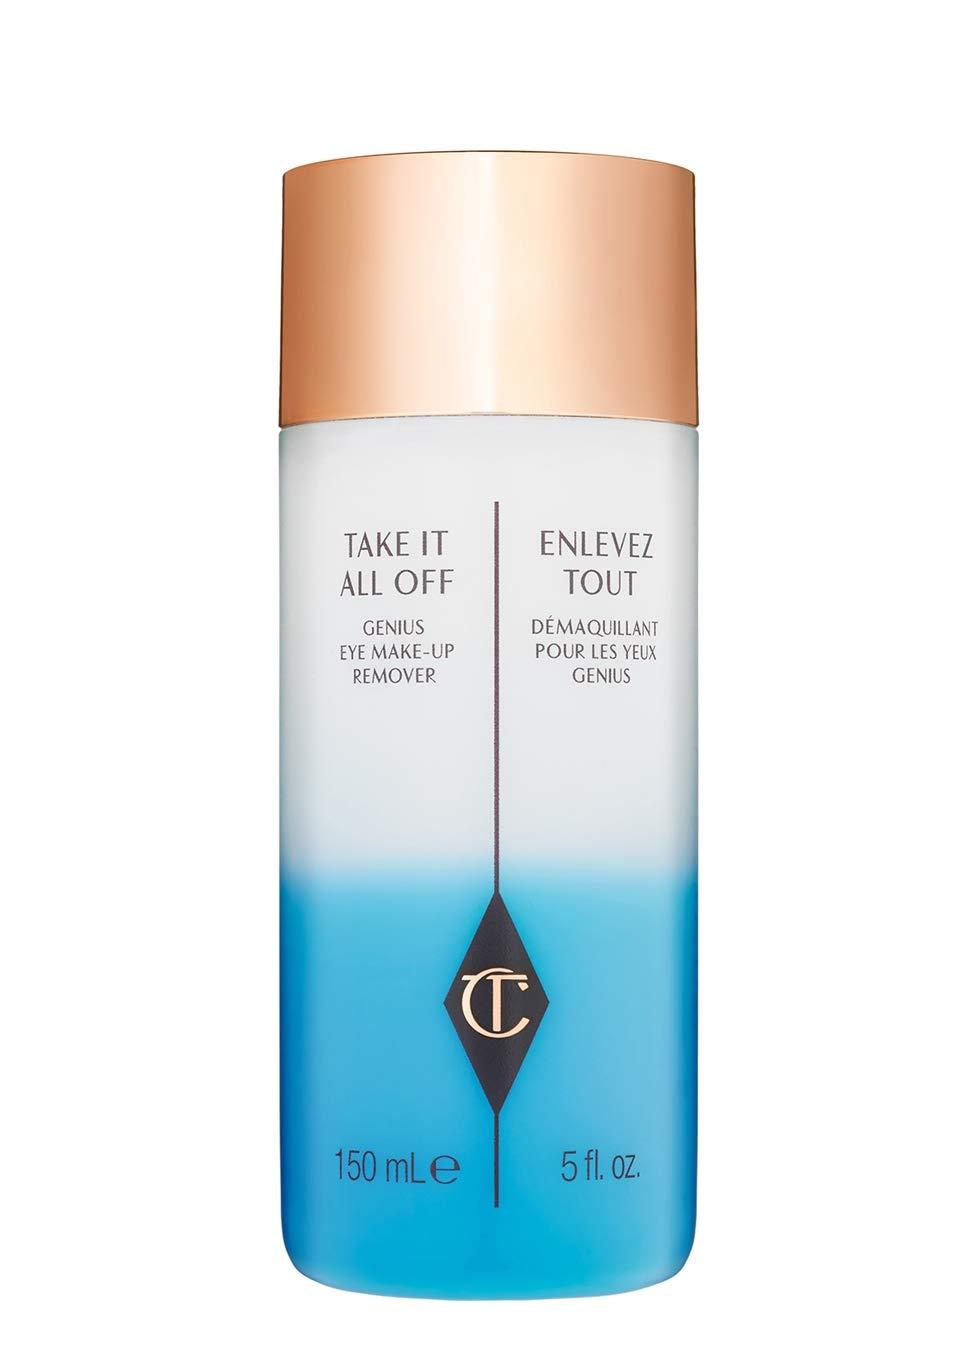 CHARLOTTE TILBURY Take It All Off eye make-up remover